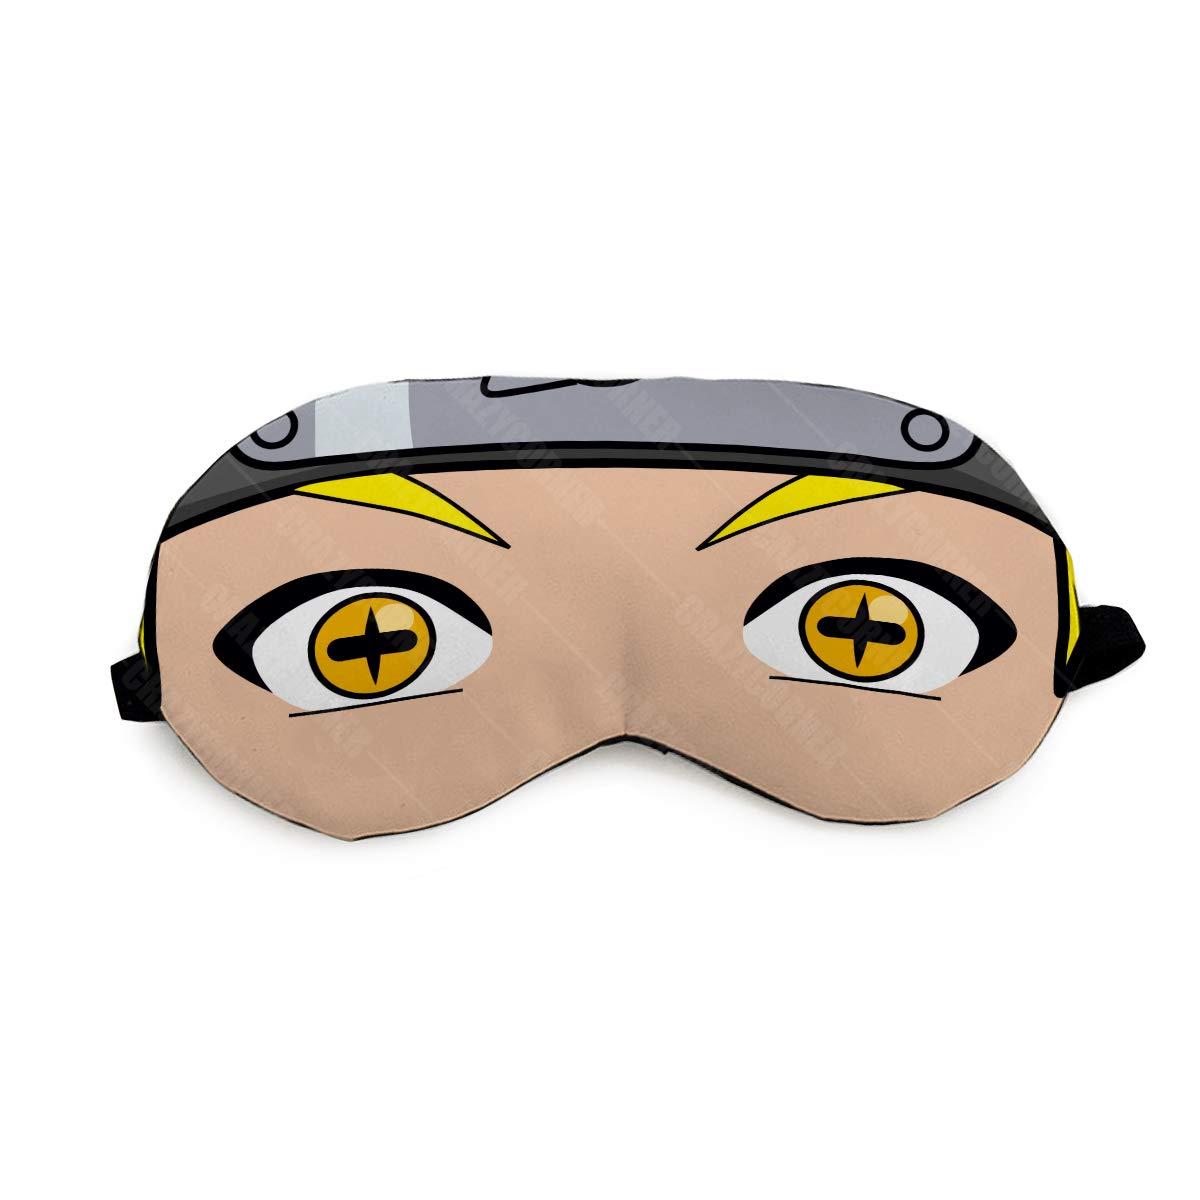 Naruto Anime Printed Eye Mask/Sleep Mask Merch latest